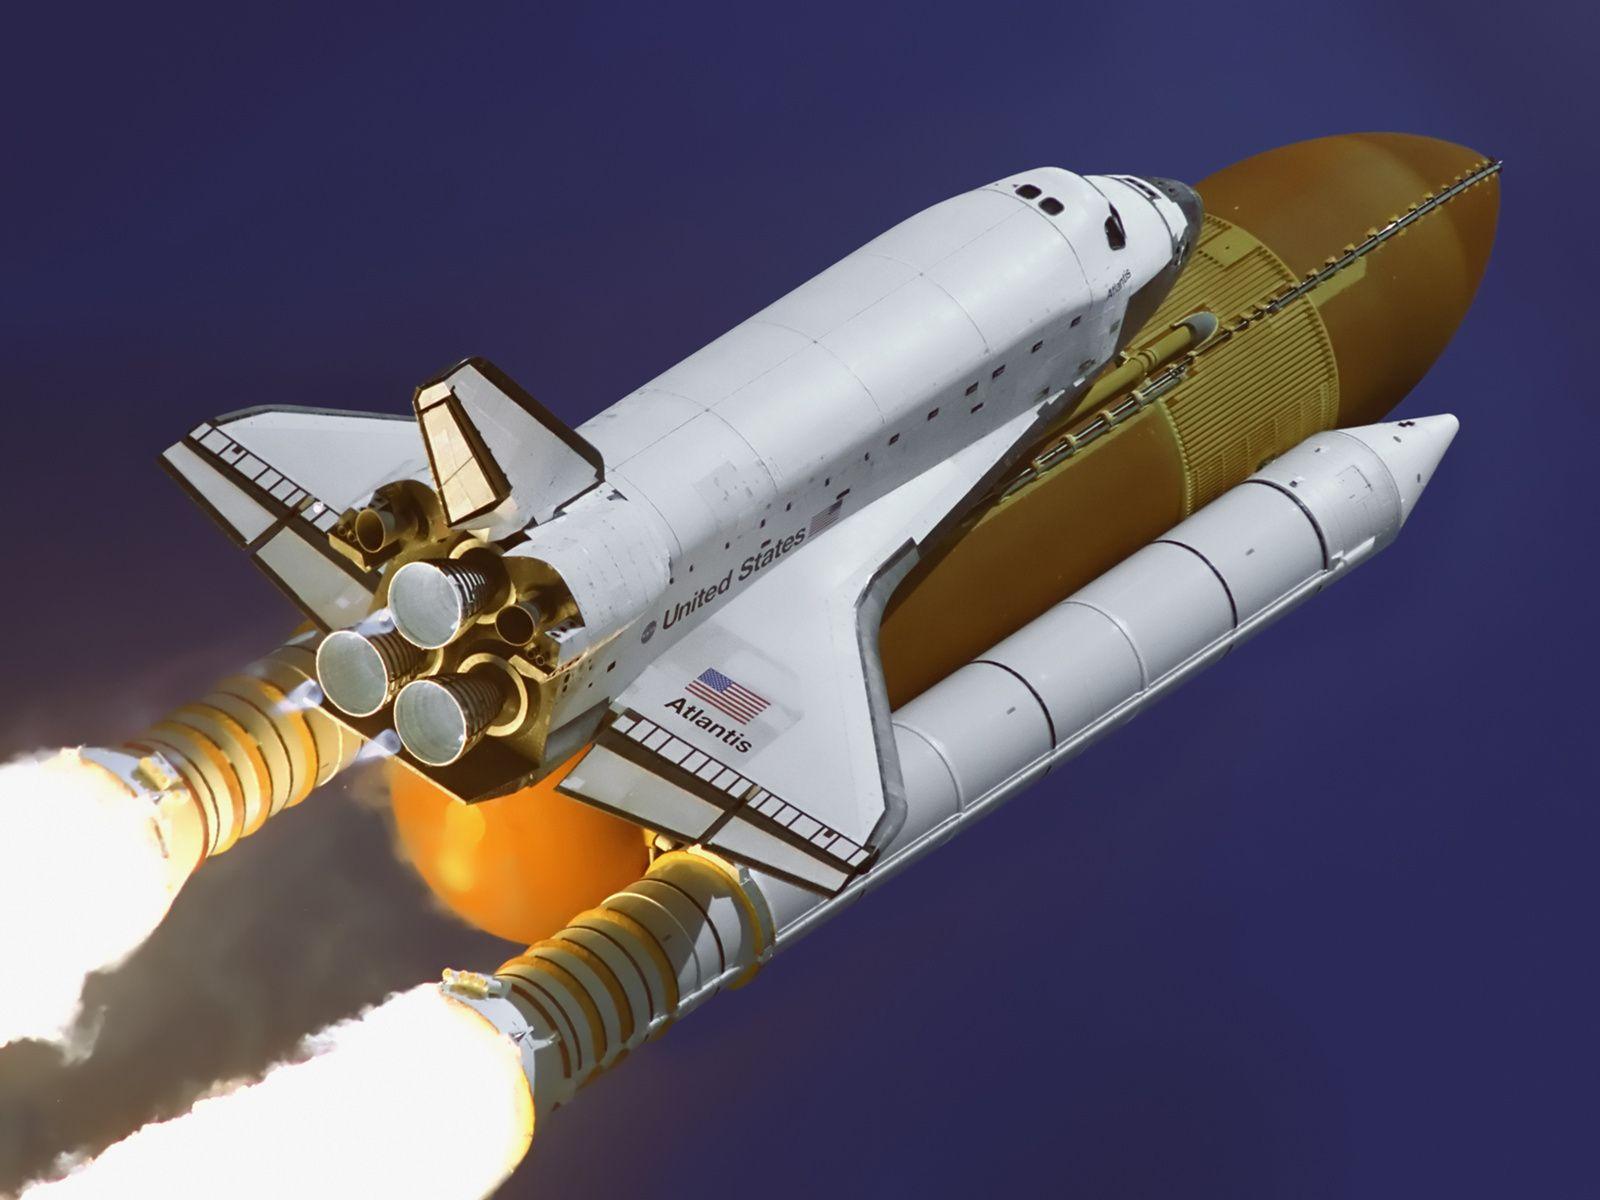 space shuttle atlantis price - photo #11